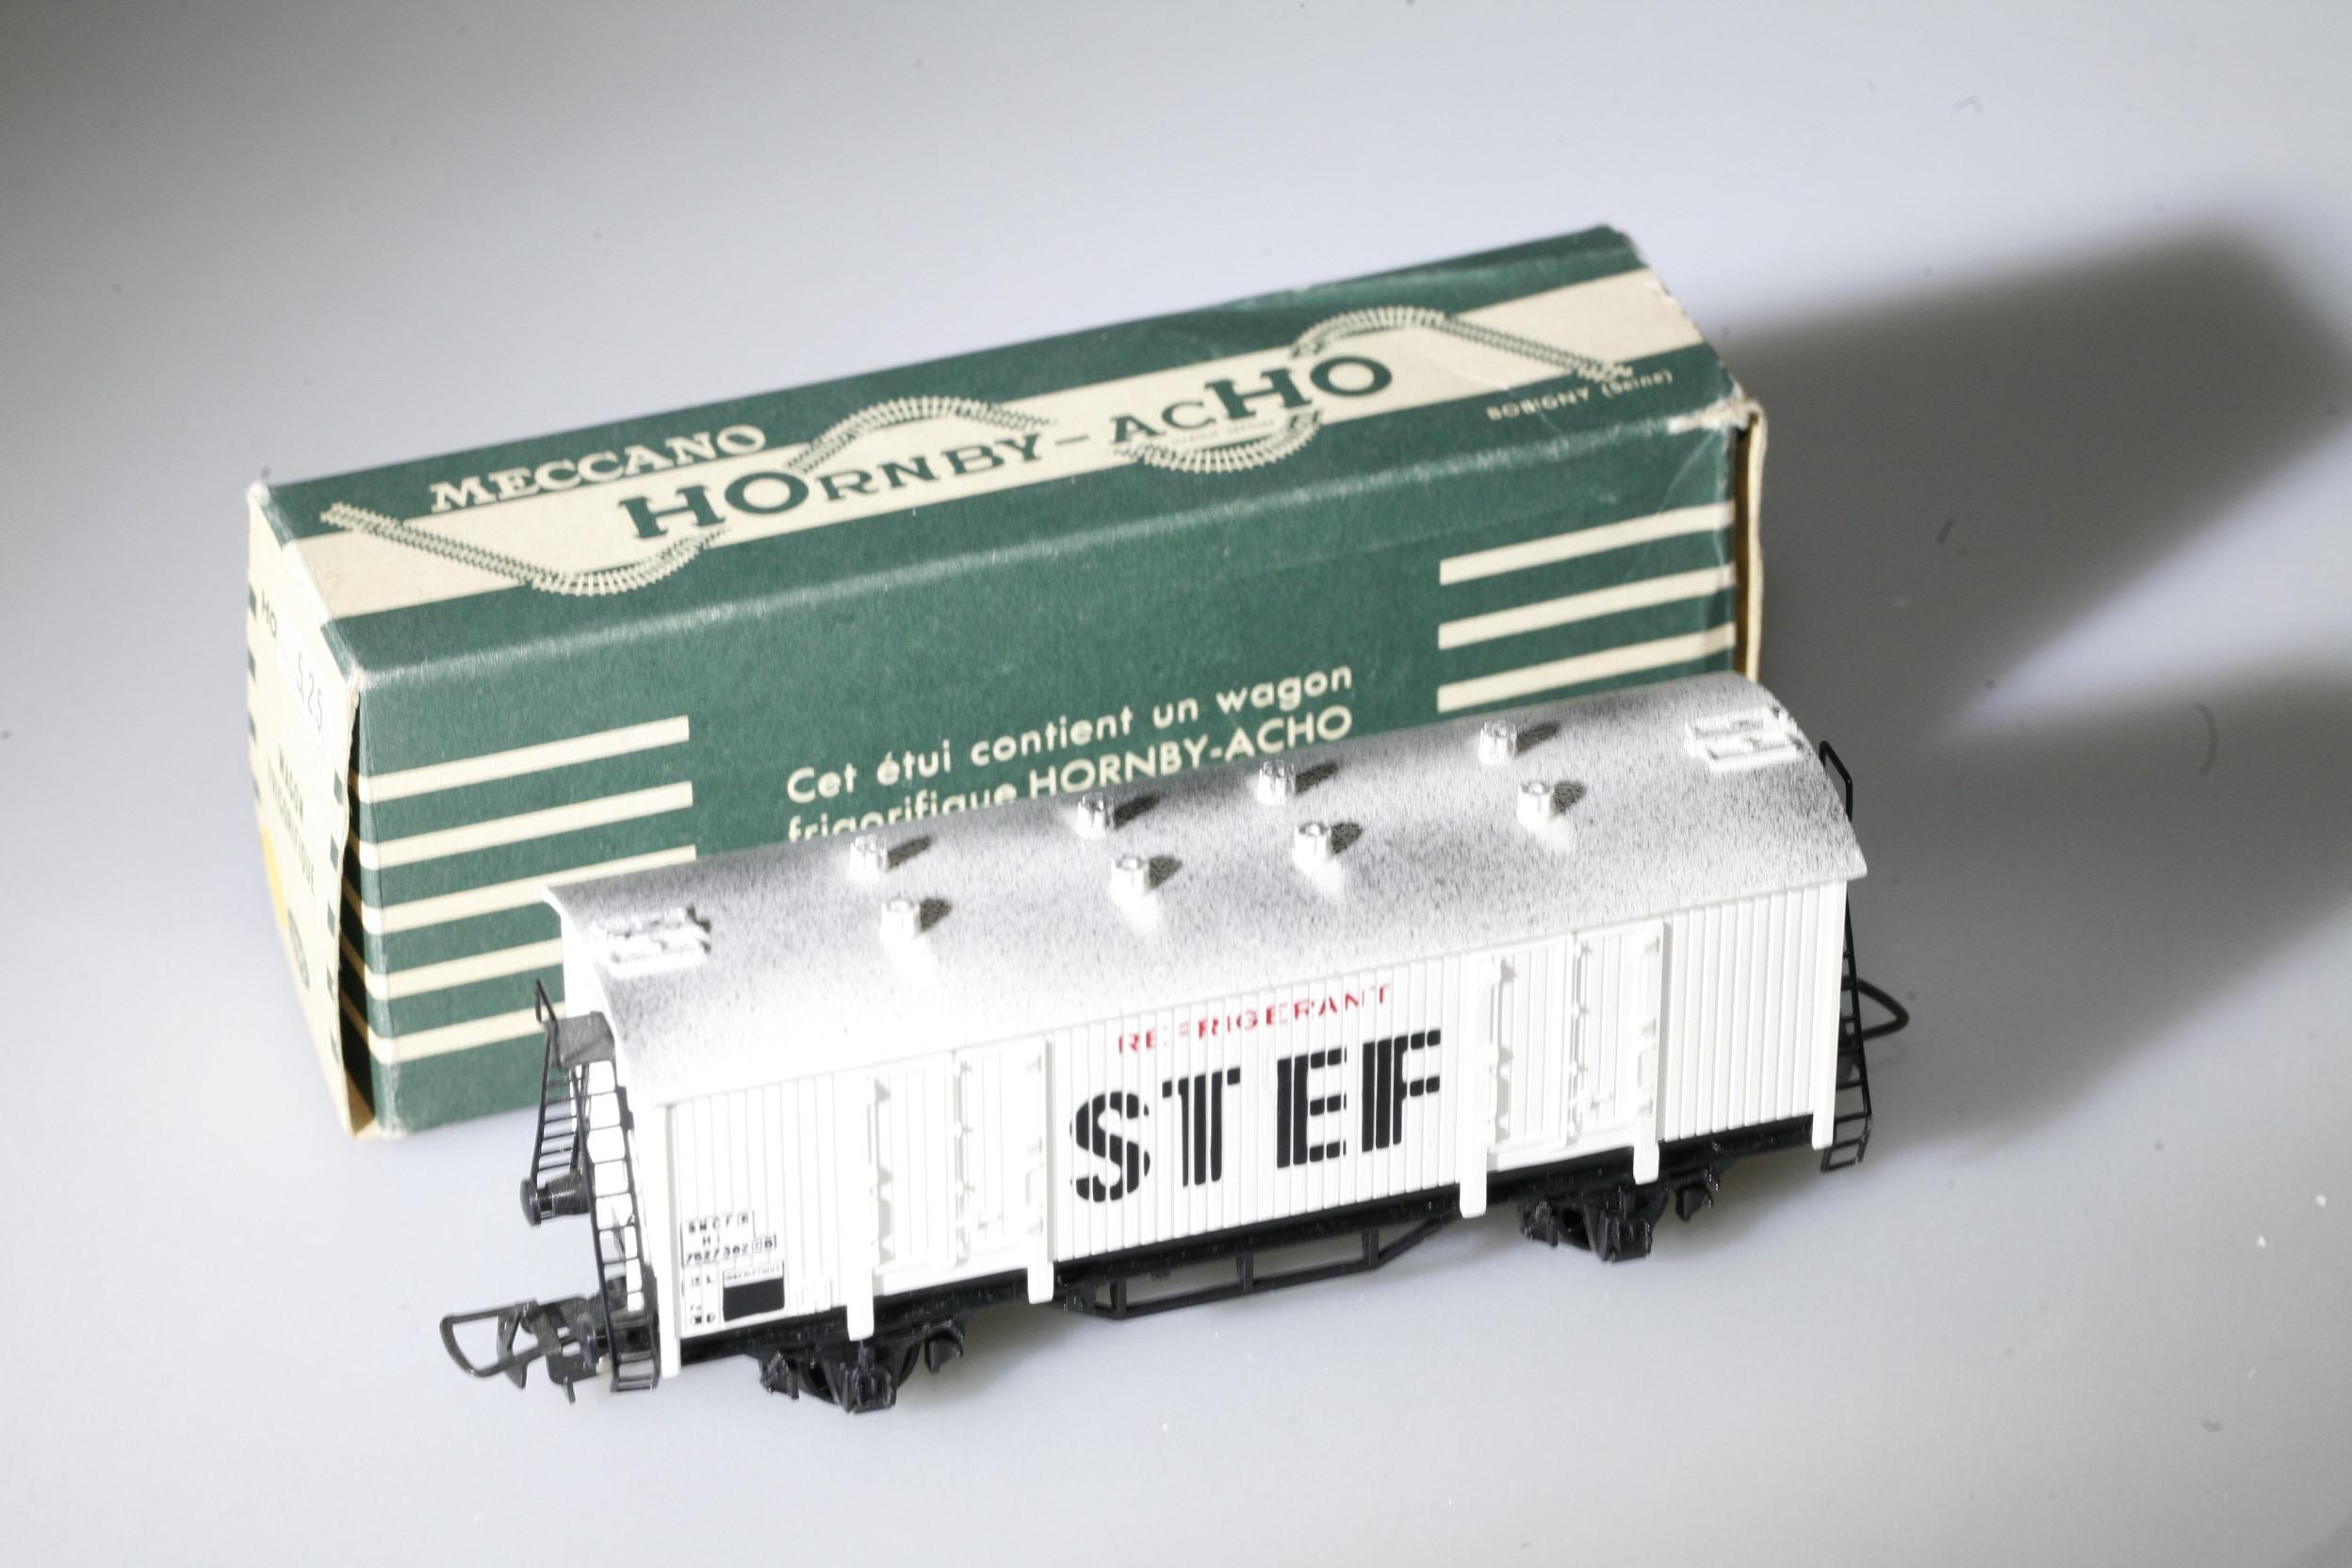 Hornby-Acho 705.1